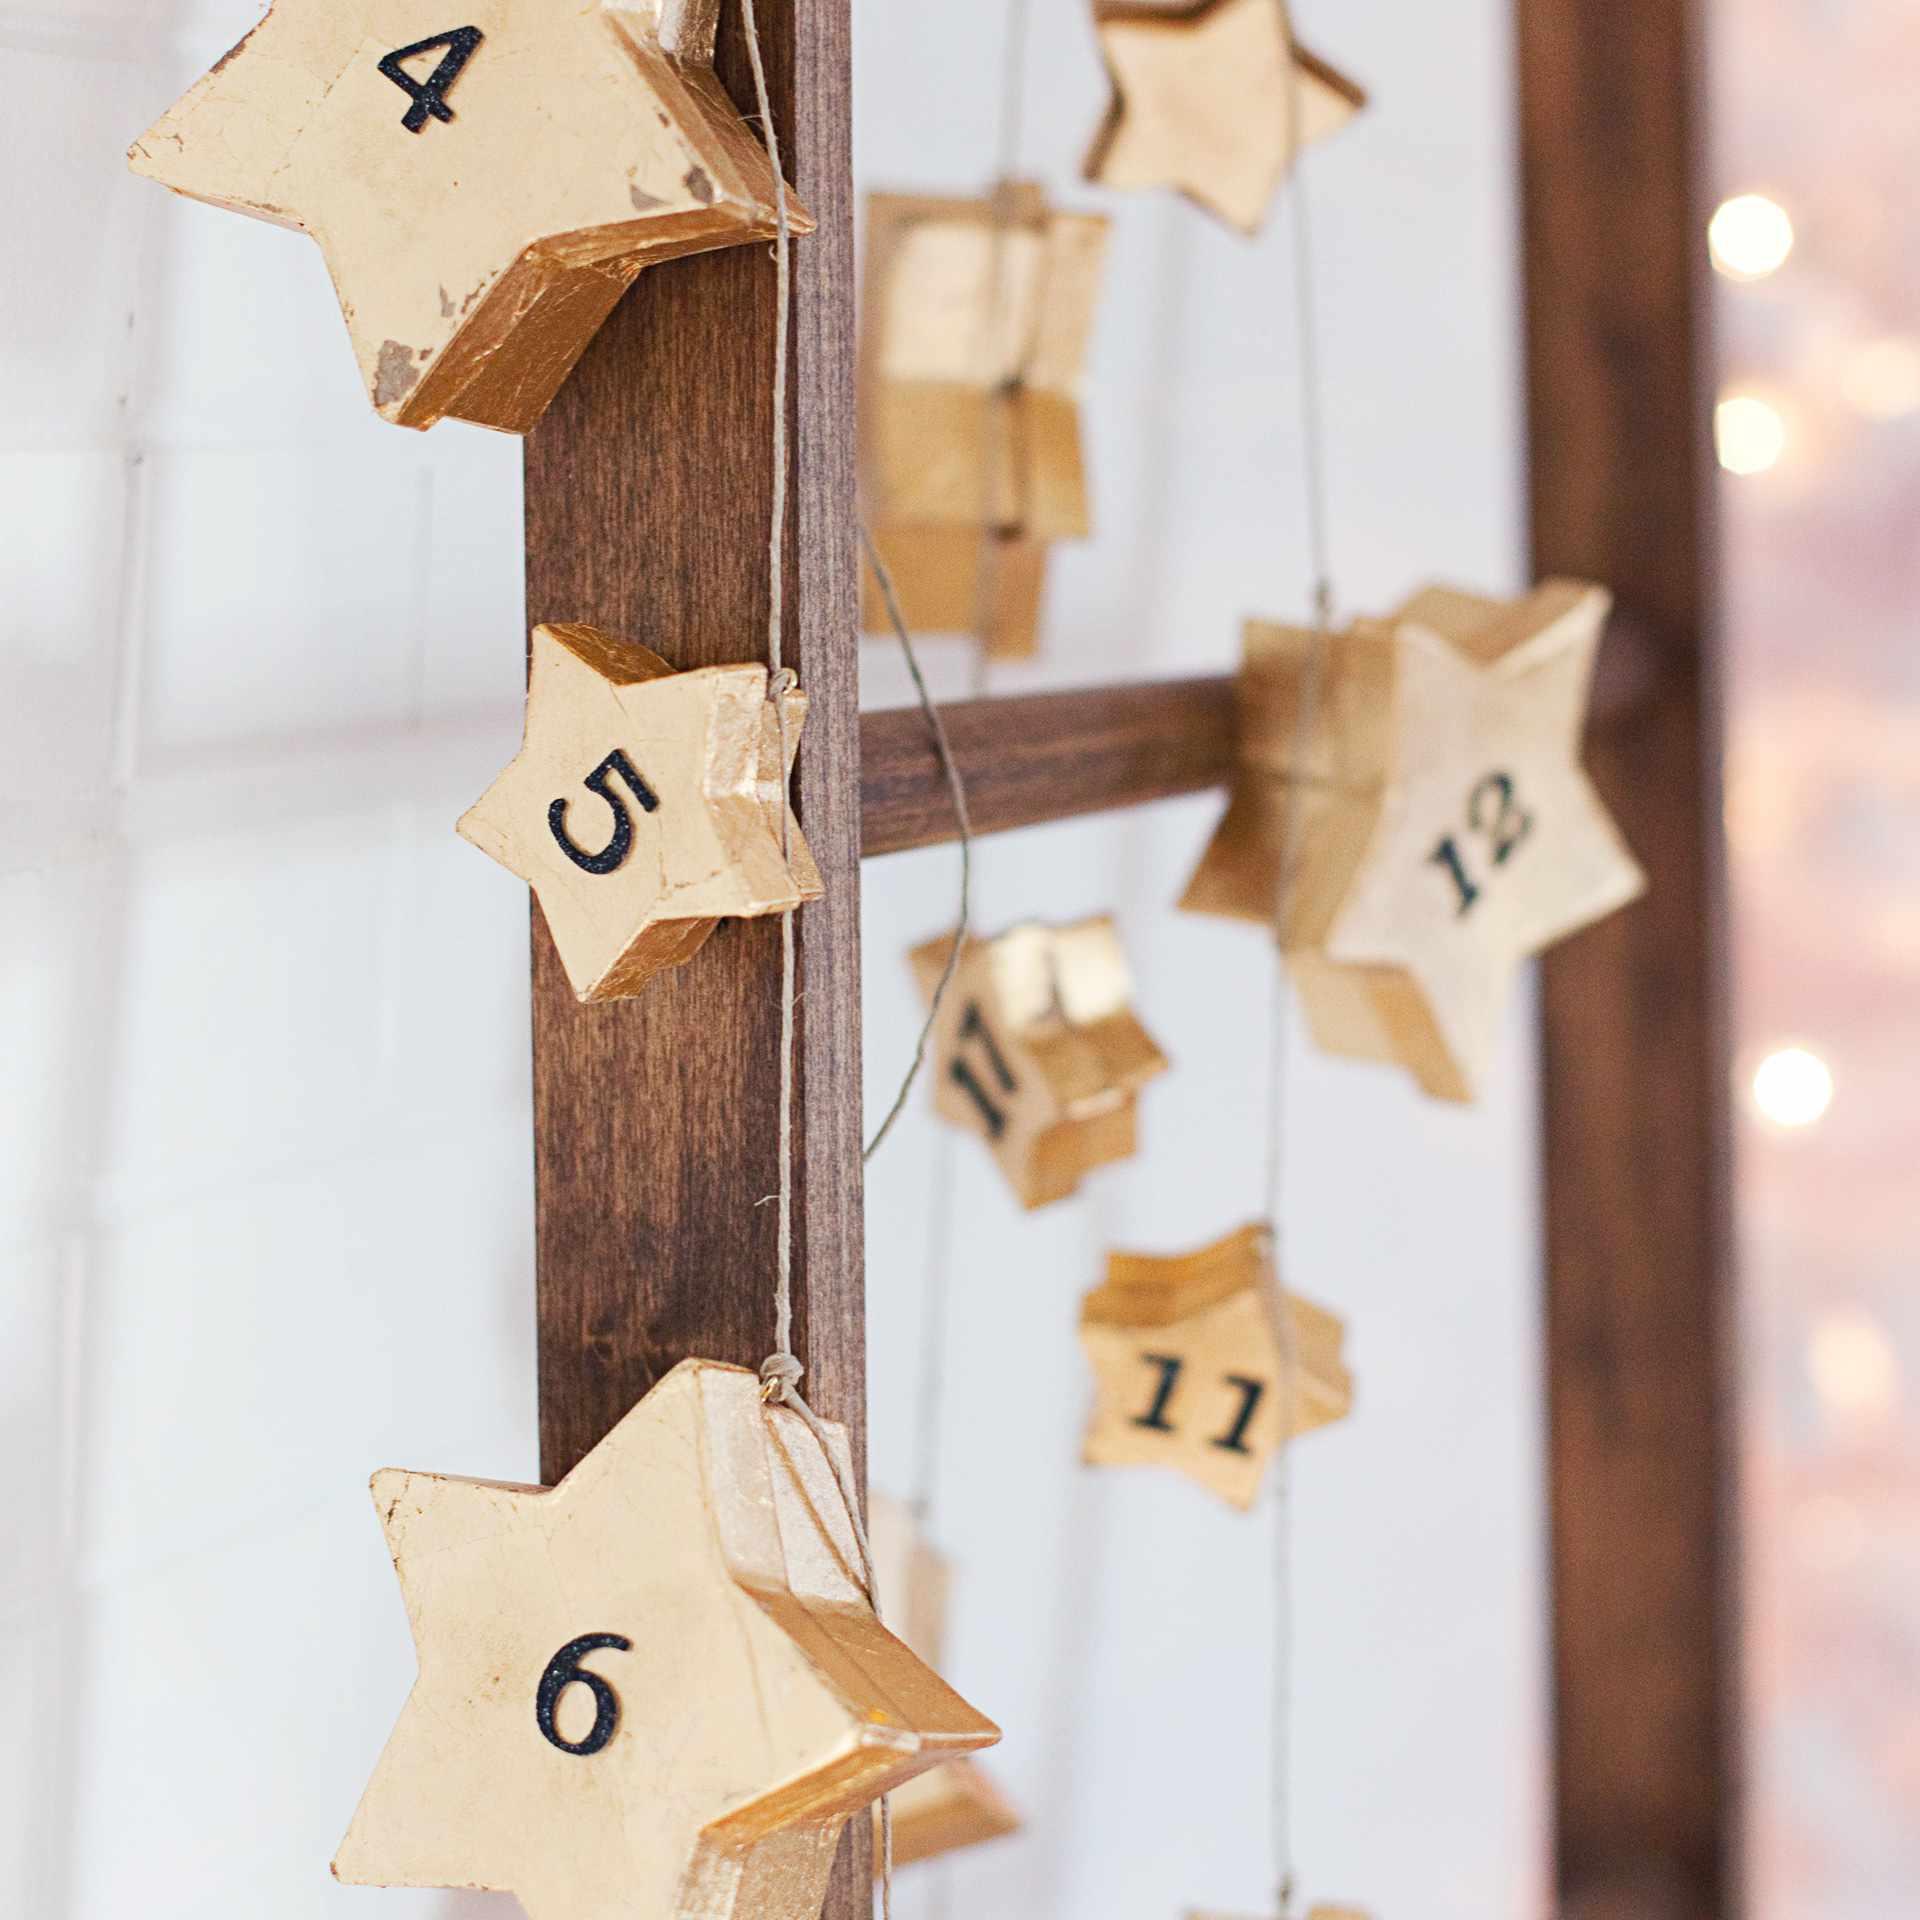 Sar garland Advent calendar